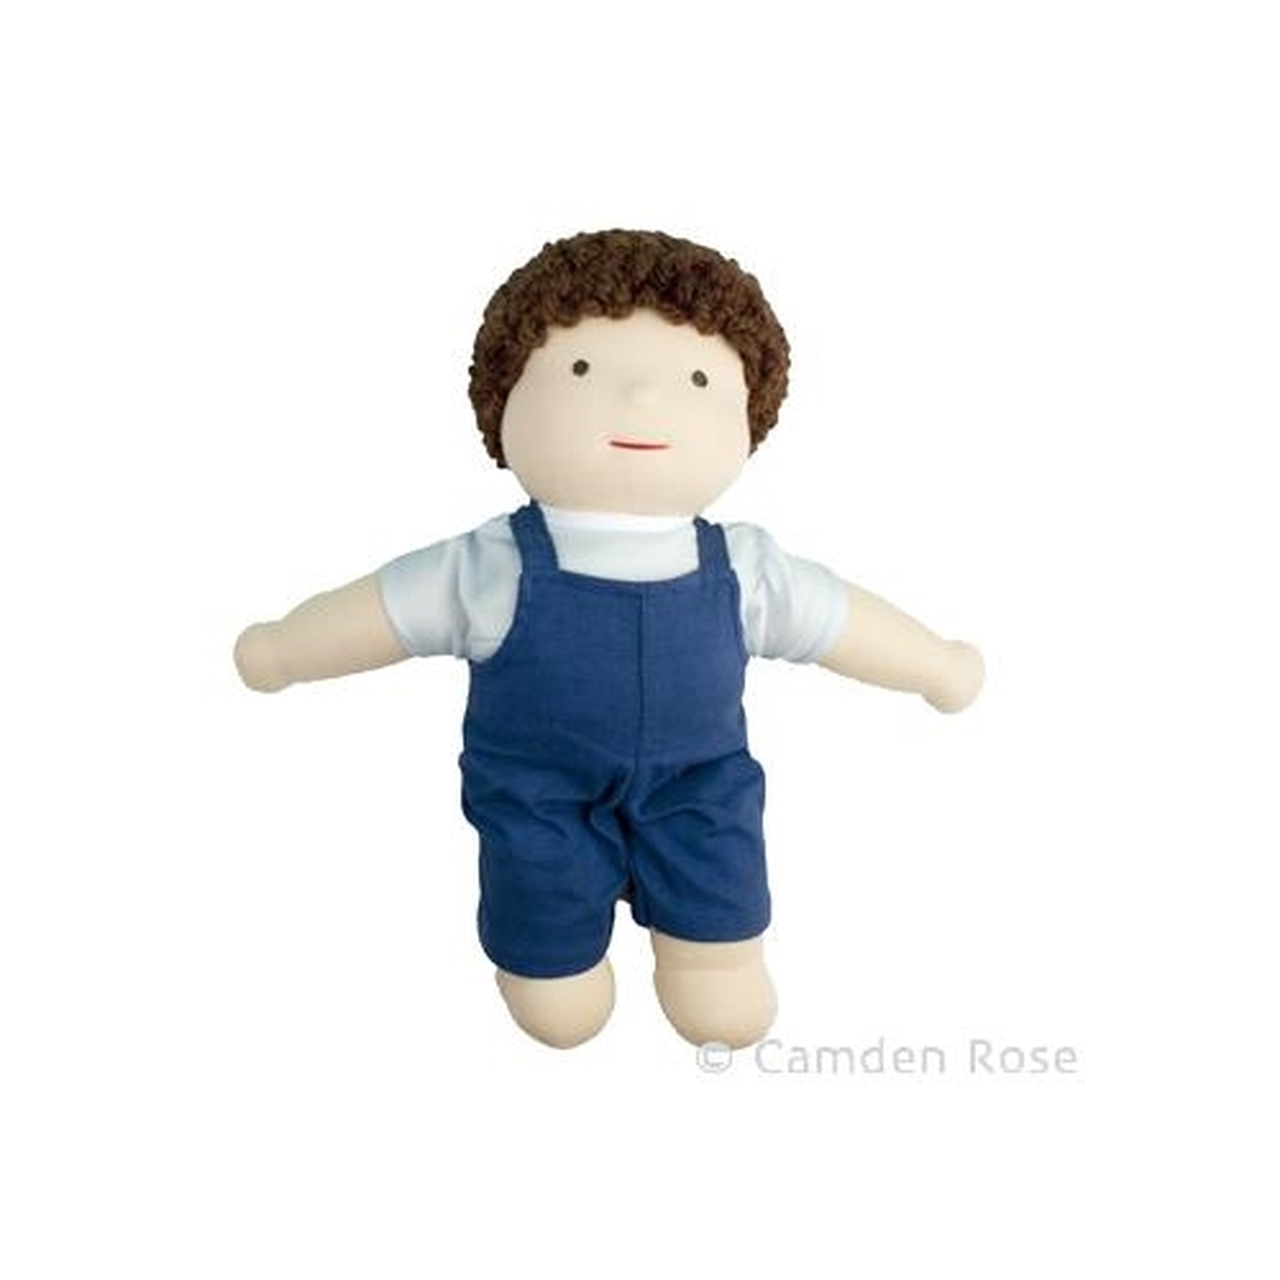 Waldorf Doll - Boy with Brown Hair